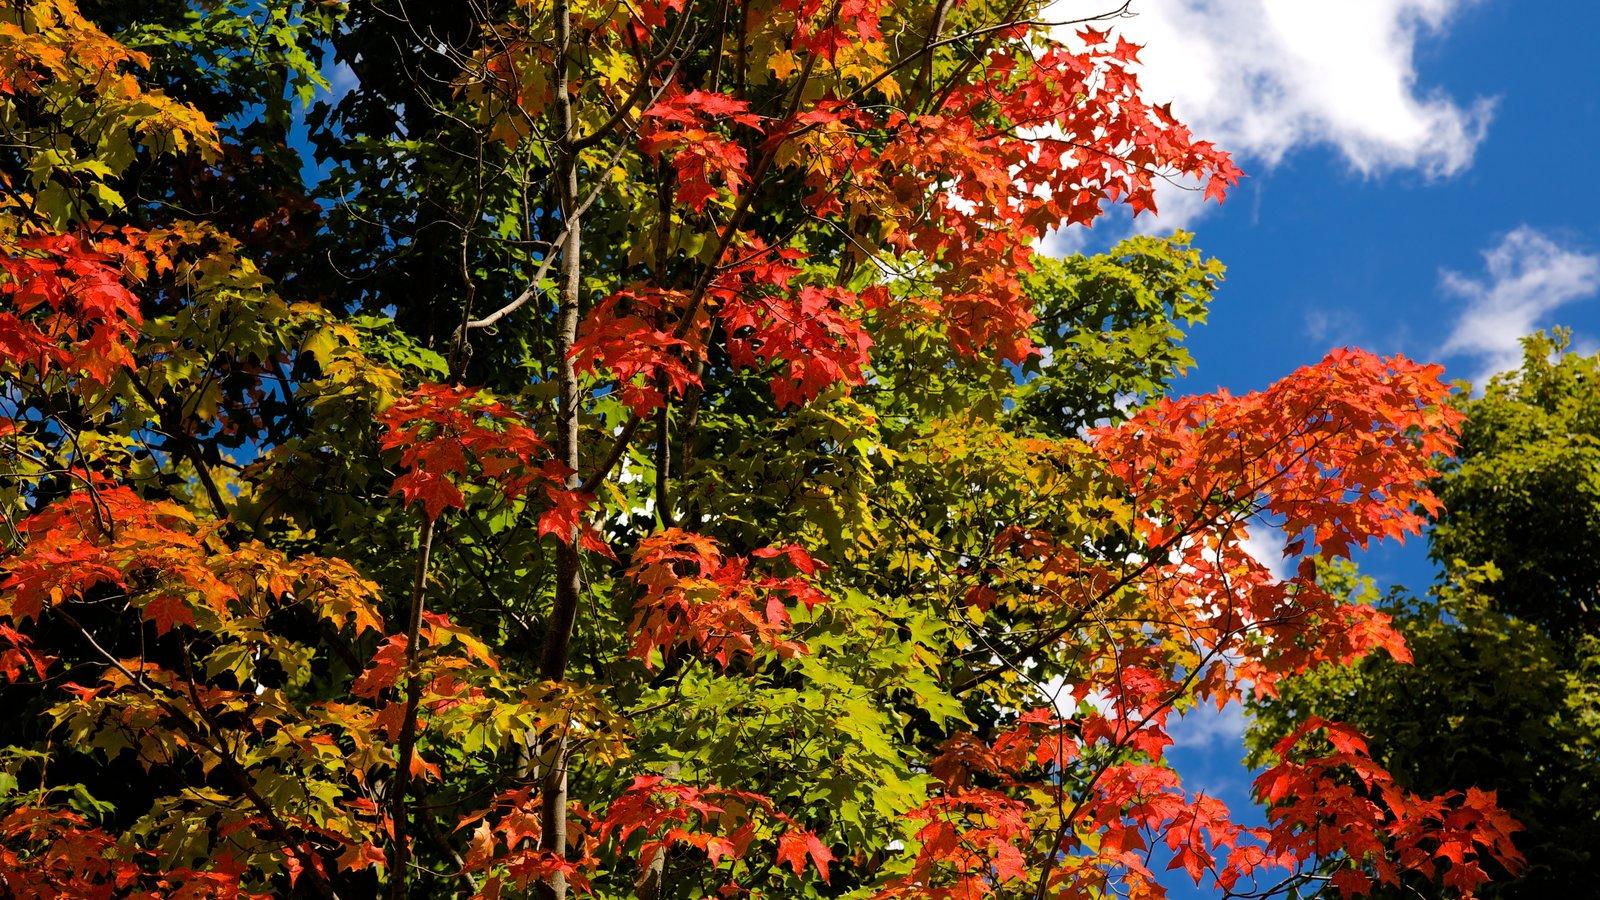 Noroeste de Pensilvânia caracterizando folhas de outono